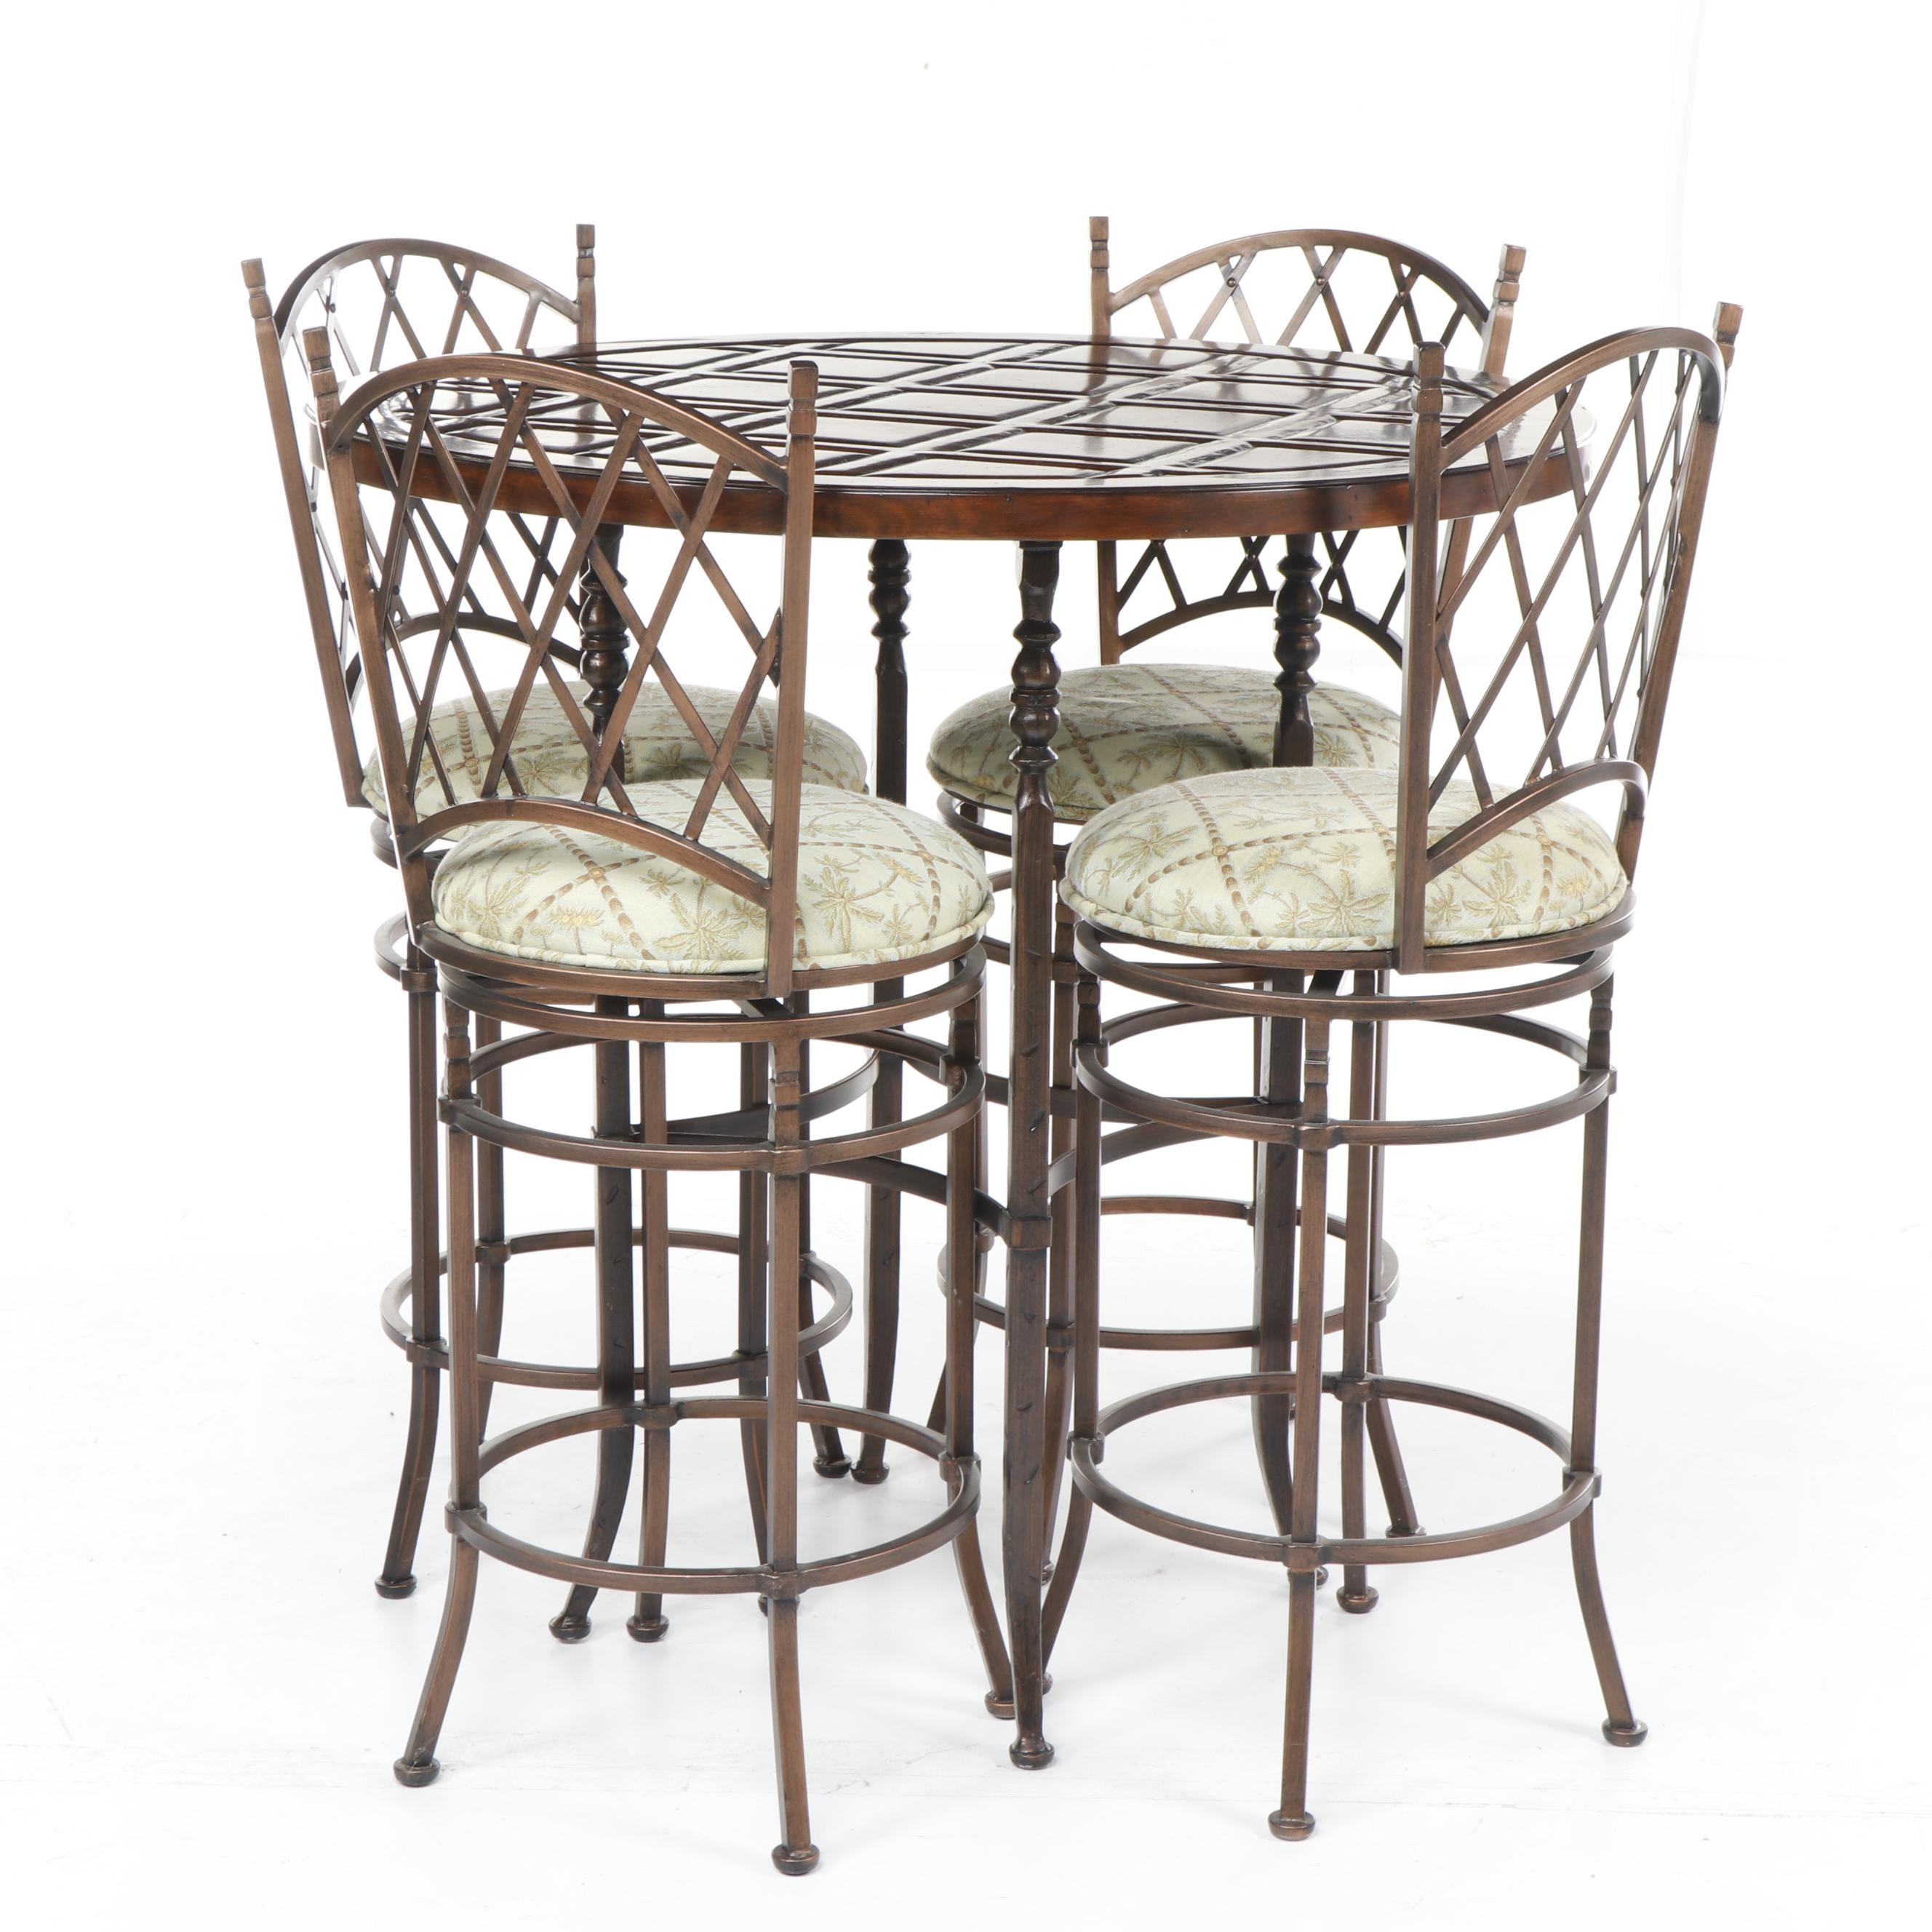 Contemporary Artistica Table and Walter E. Smithe Copper Tone Metal Stools